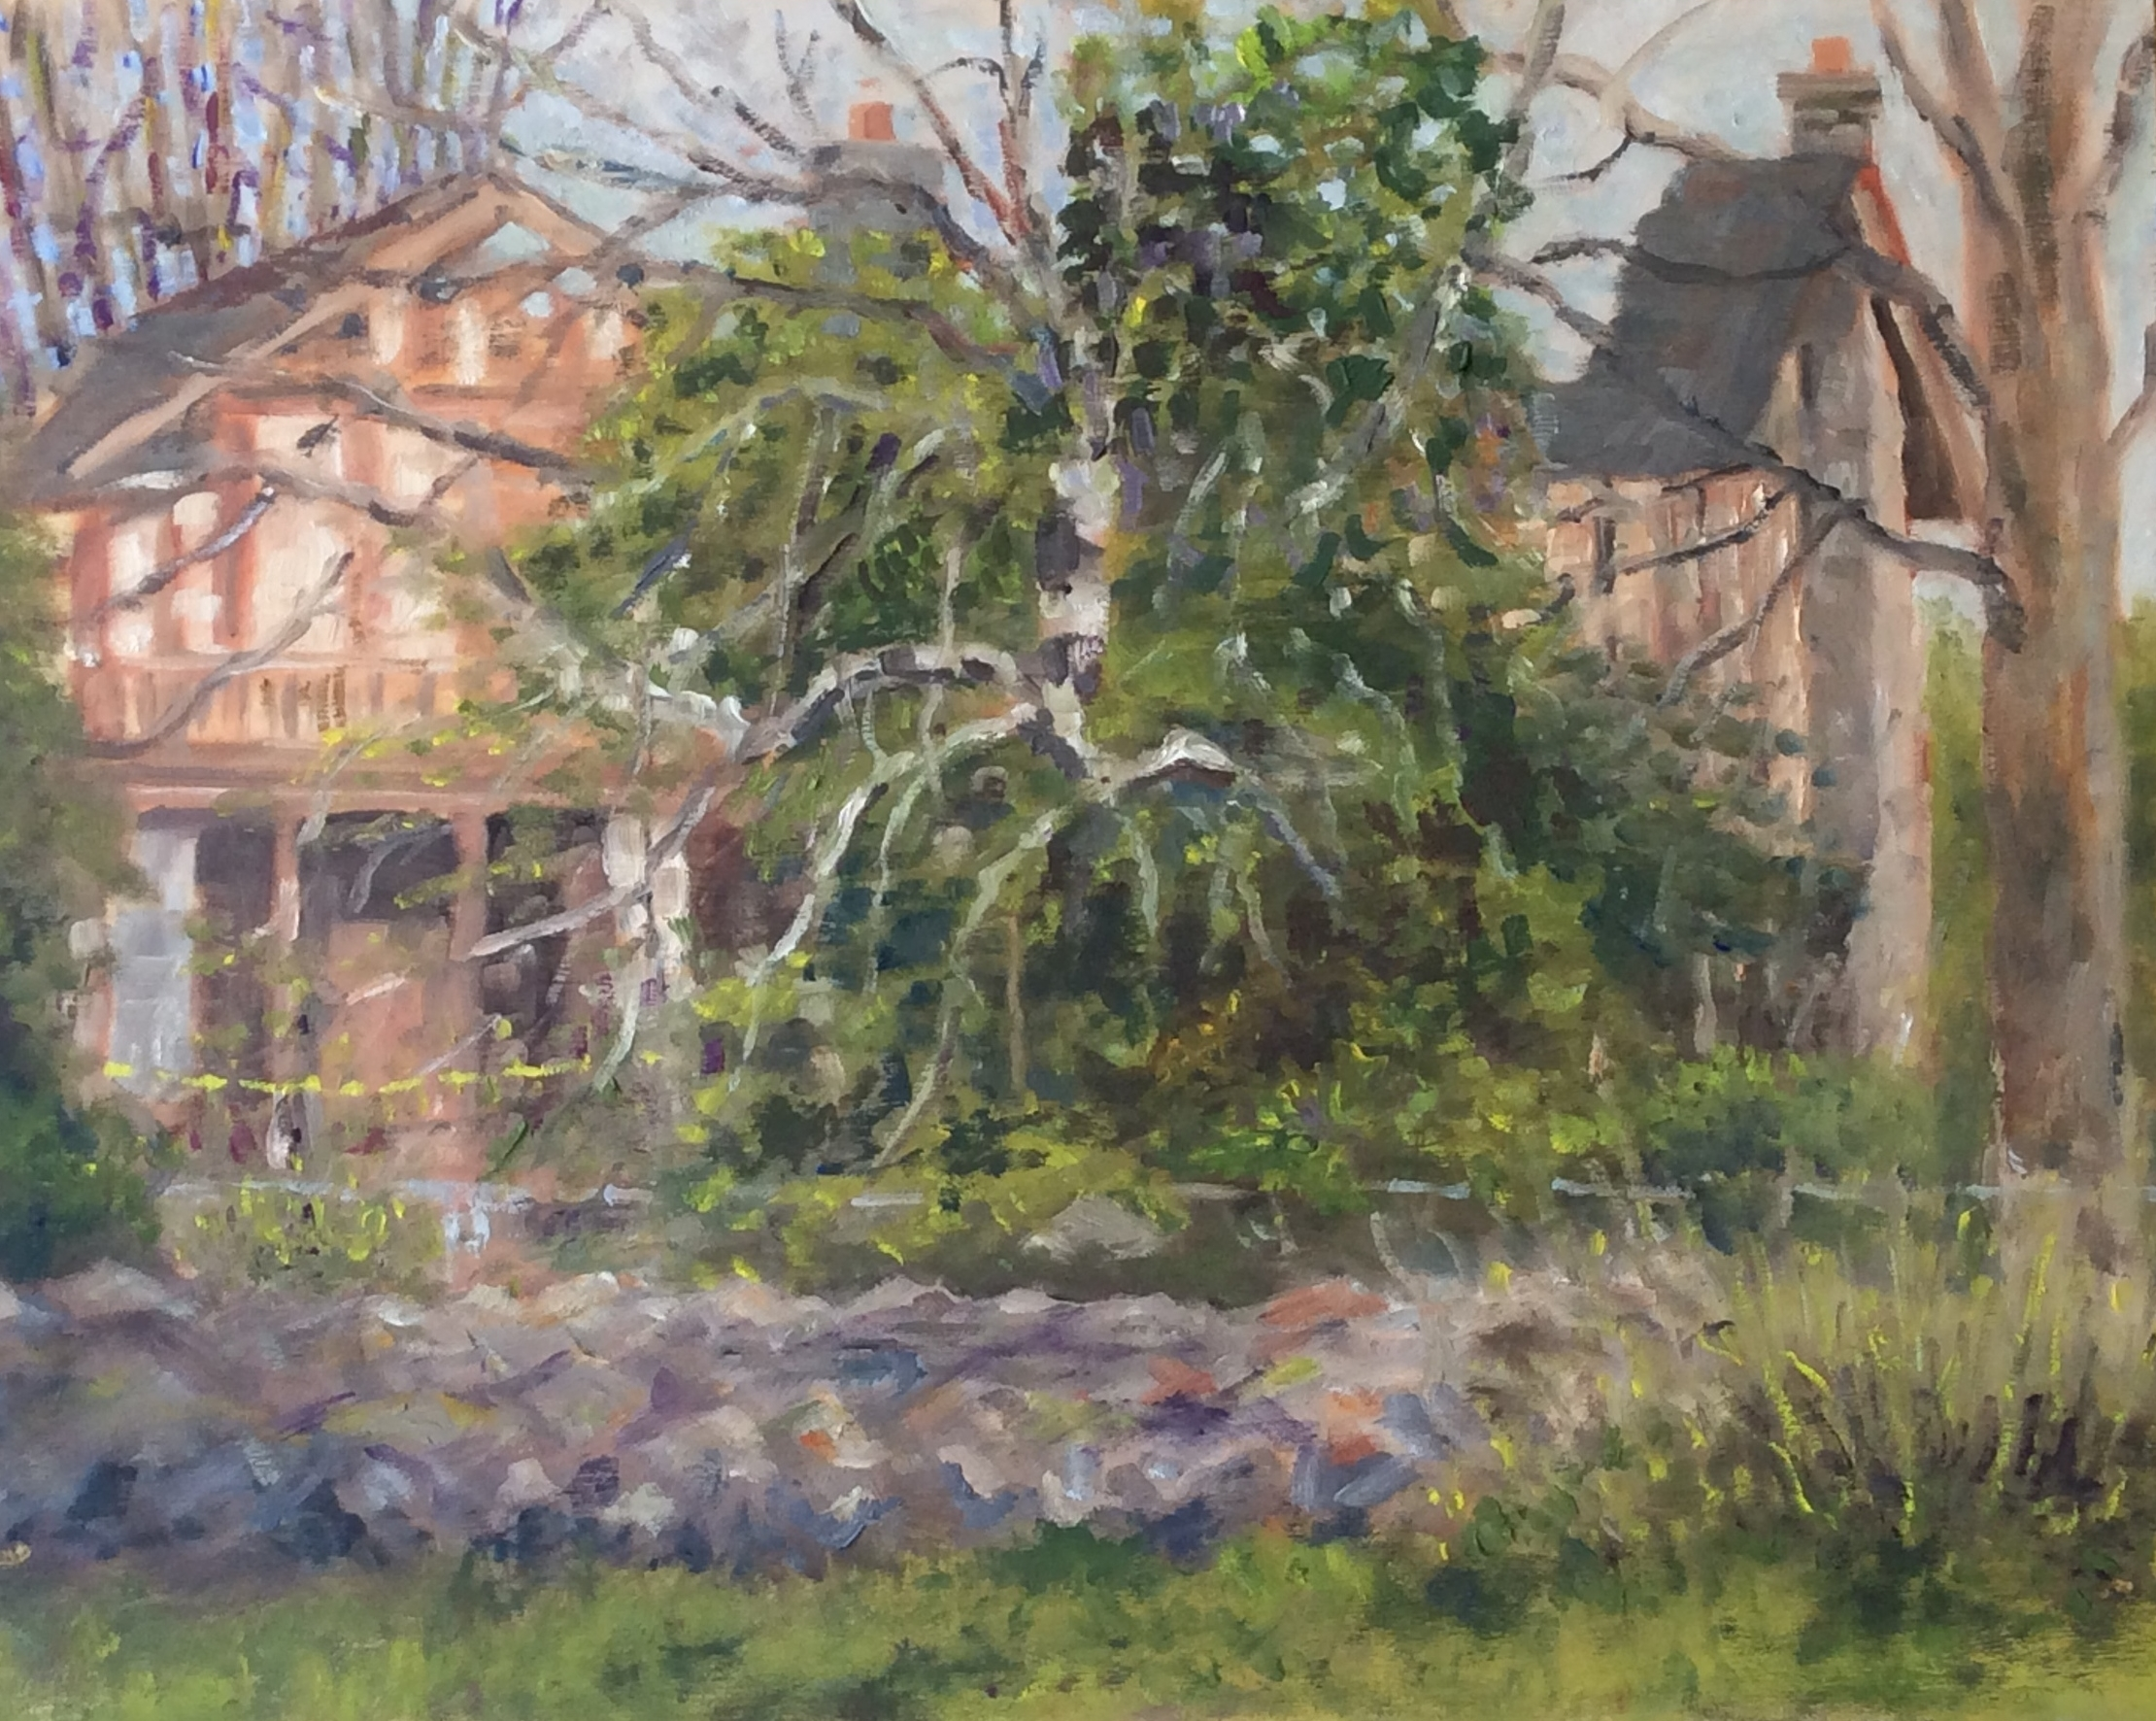 Cat Lady's Derelict House   Oil 11 x 14